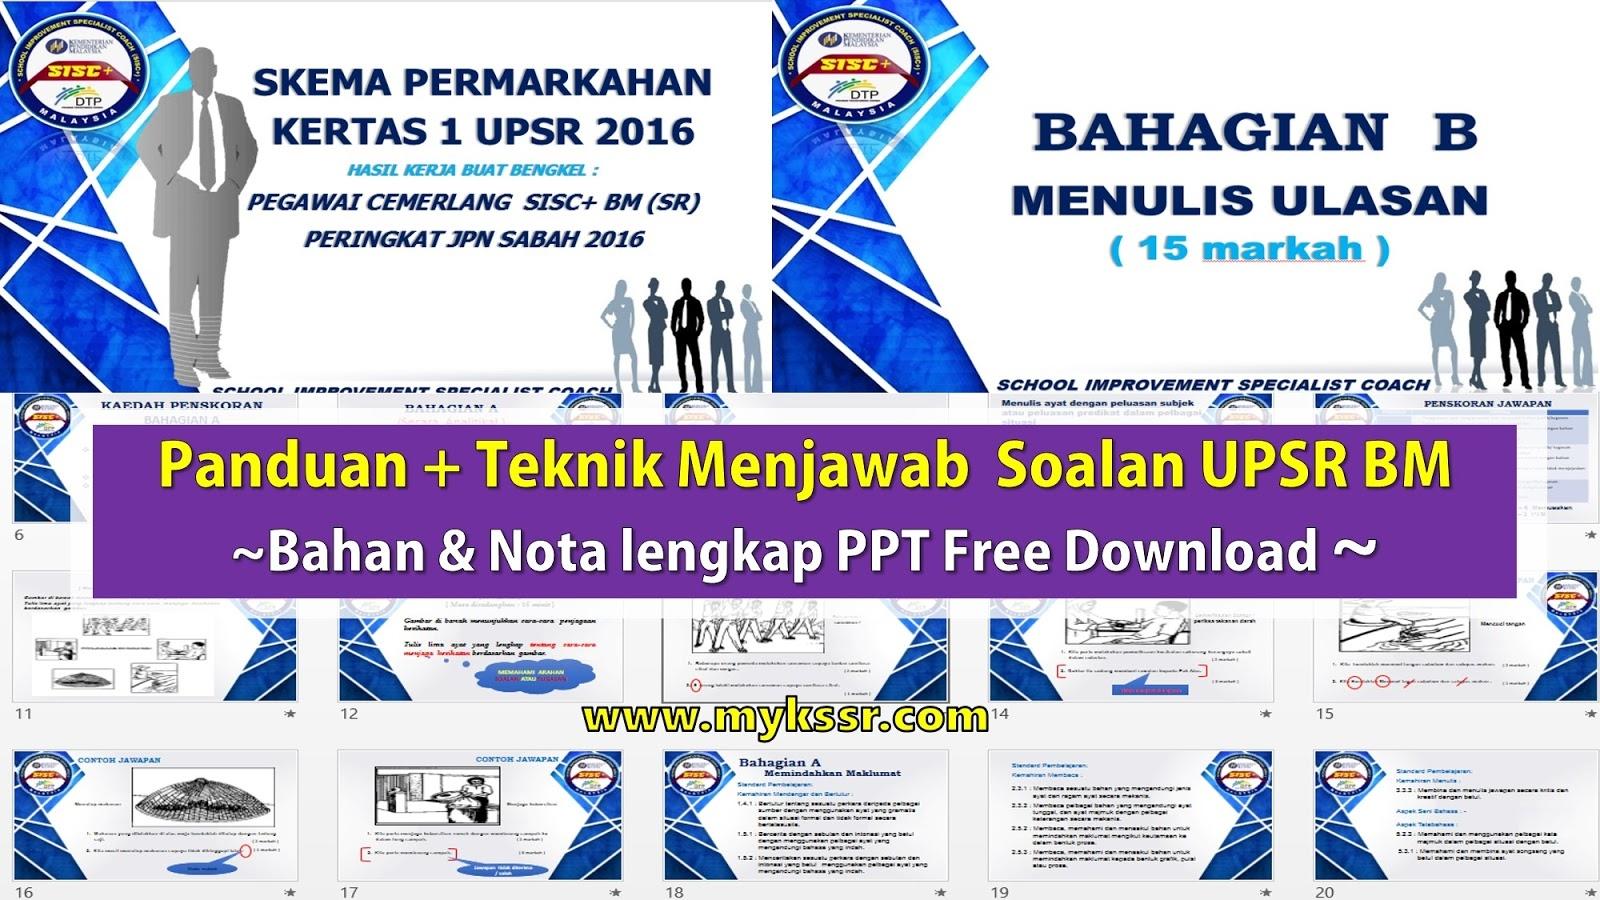 Nota Padat Bahasa Melayu Upsr Yang Berguna Panduan Teknik Menjawab soalan Upsr Bm Download Nota Lengkap Of Muat Turun Nota Padat Bahasa Melayu Upsr Yang Menarik Untuk Para Ibubapa Download